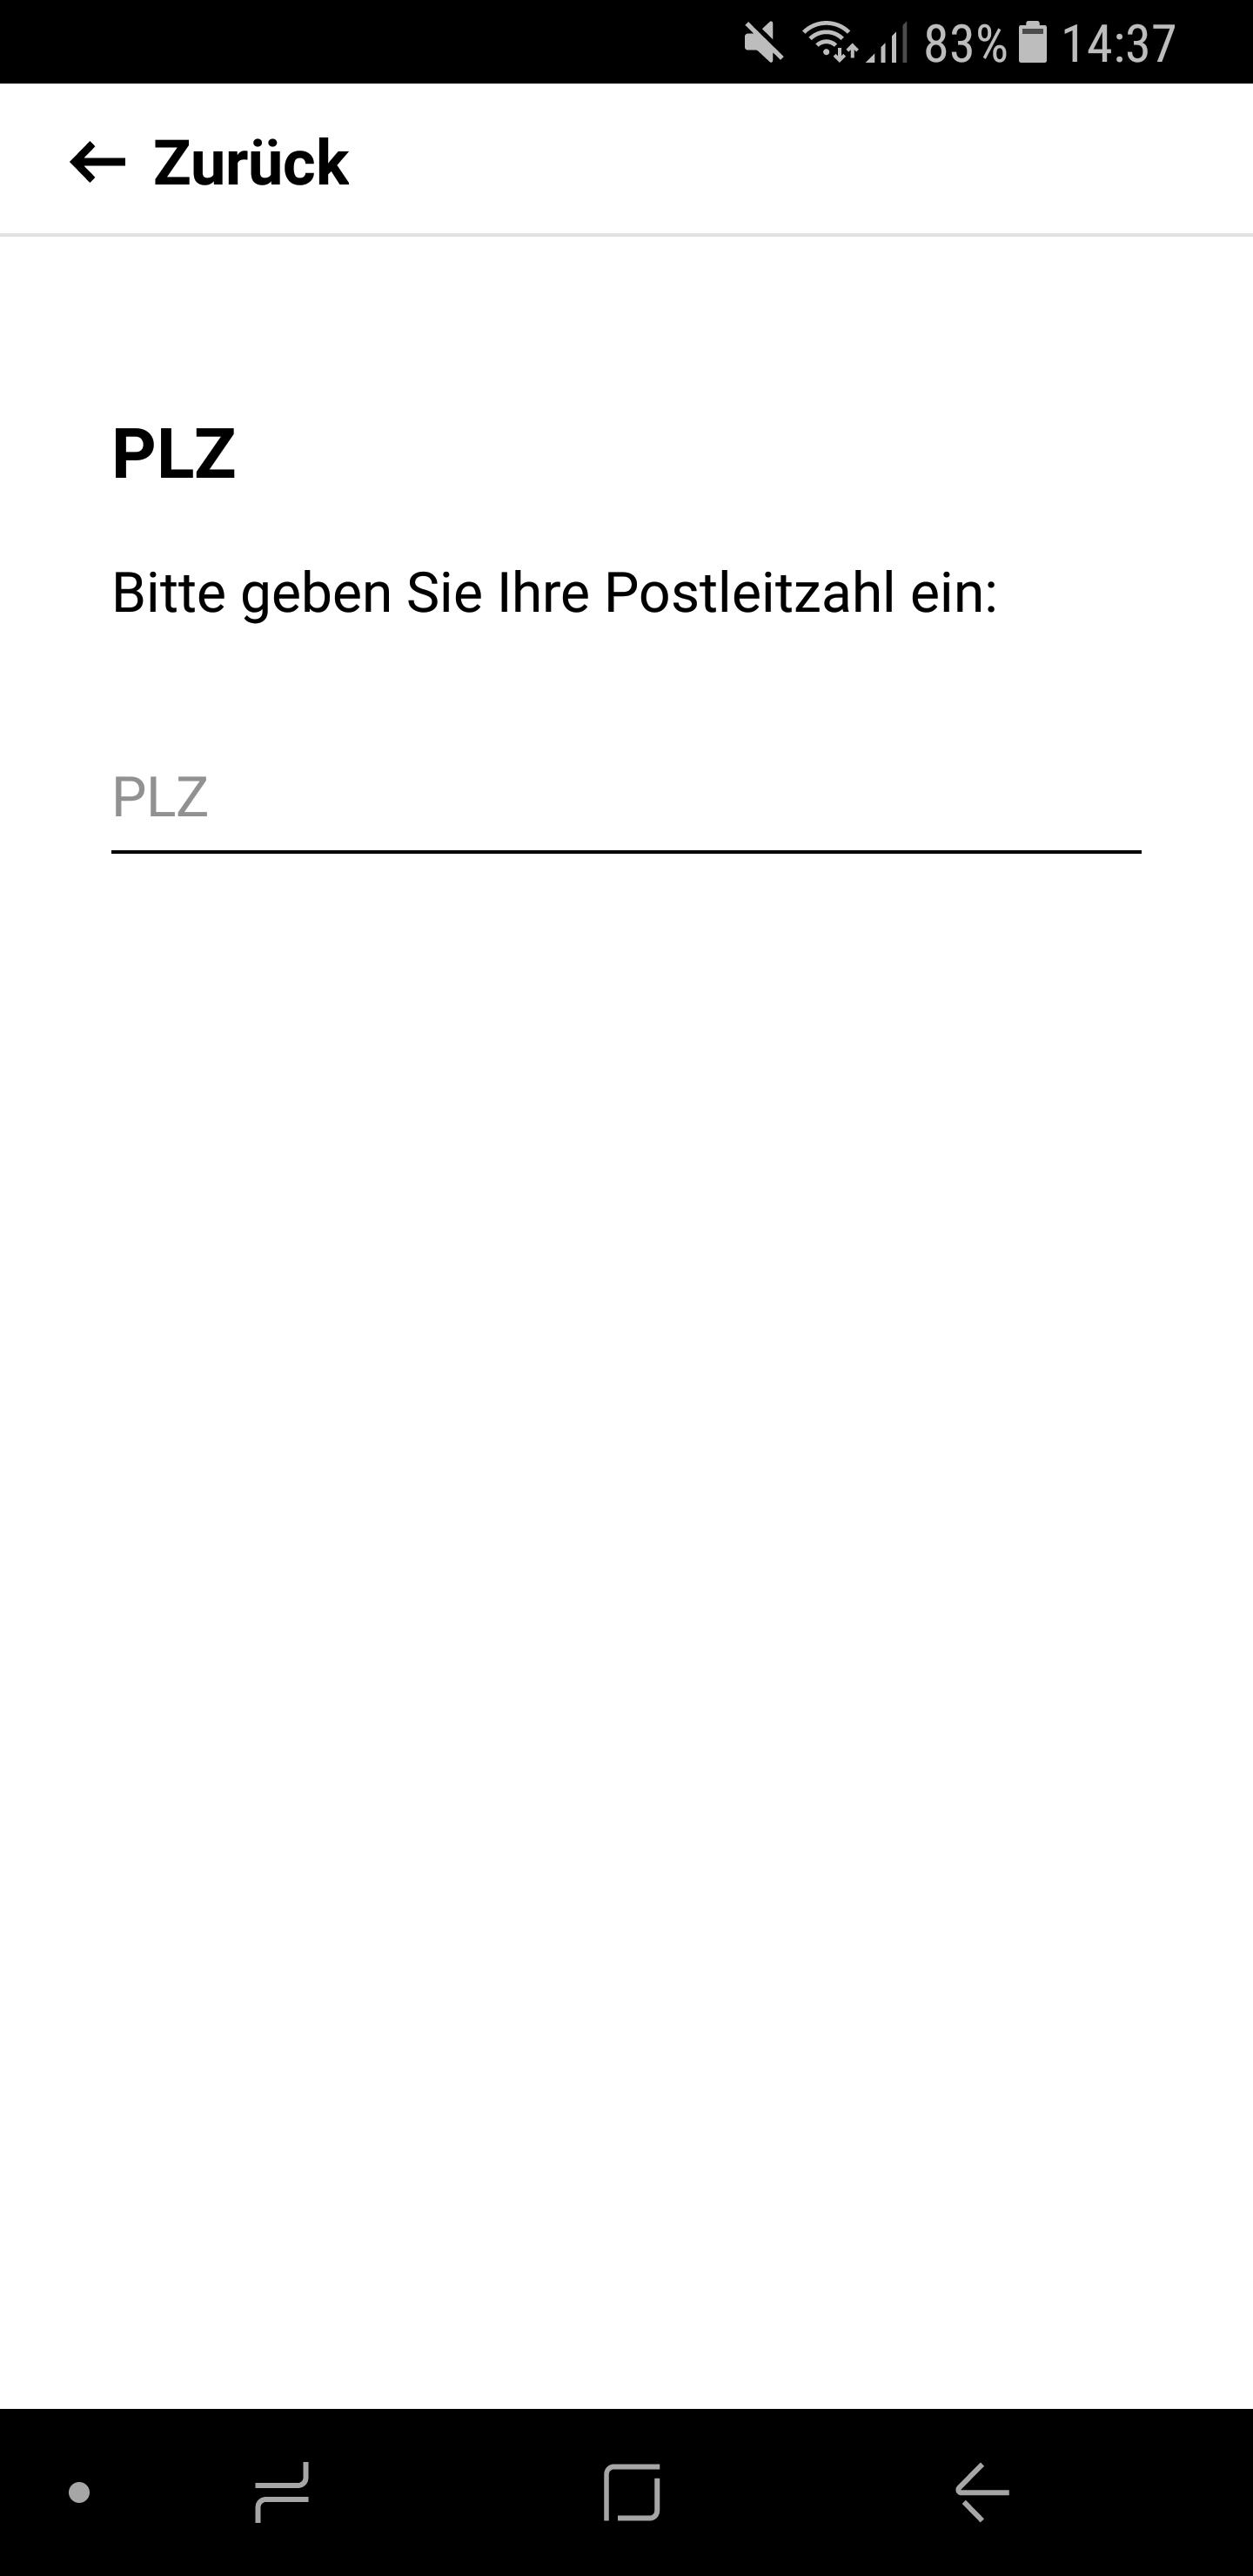 Sonos Anmeldung 11